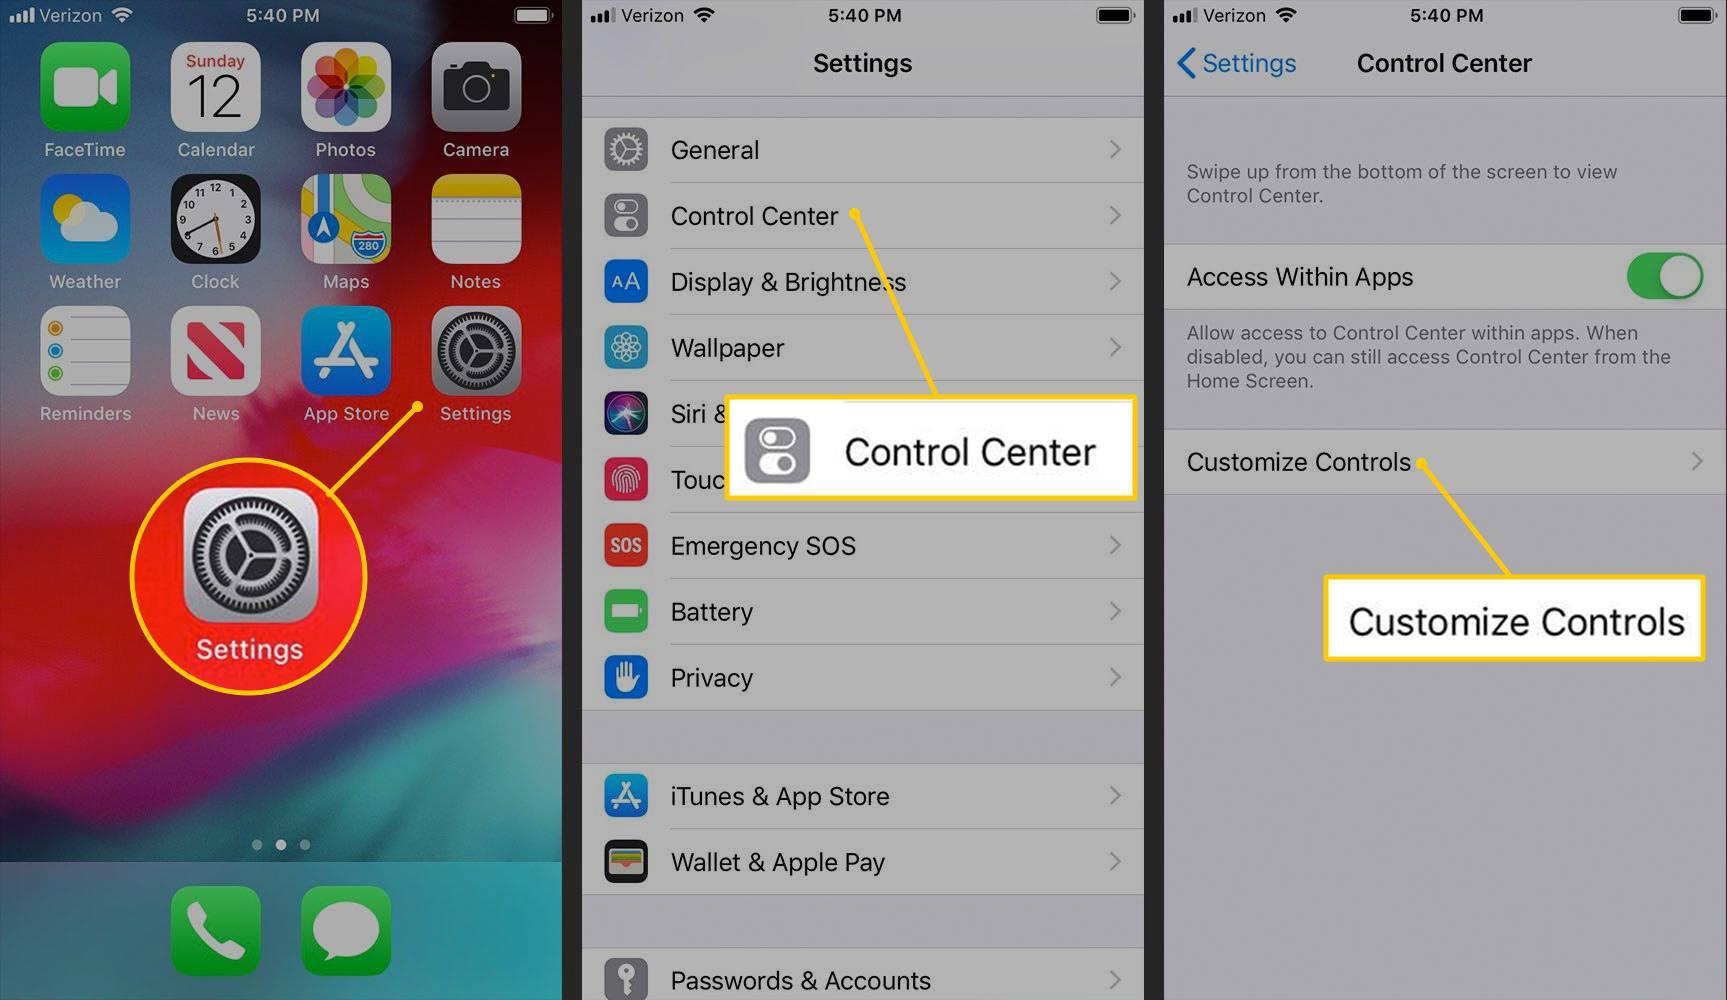 Settings, Control Center, Customize Controls